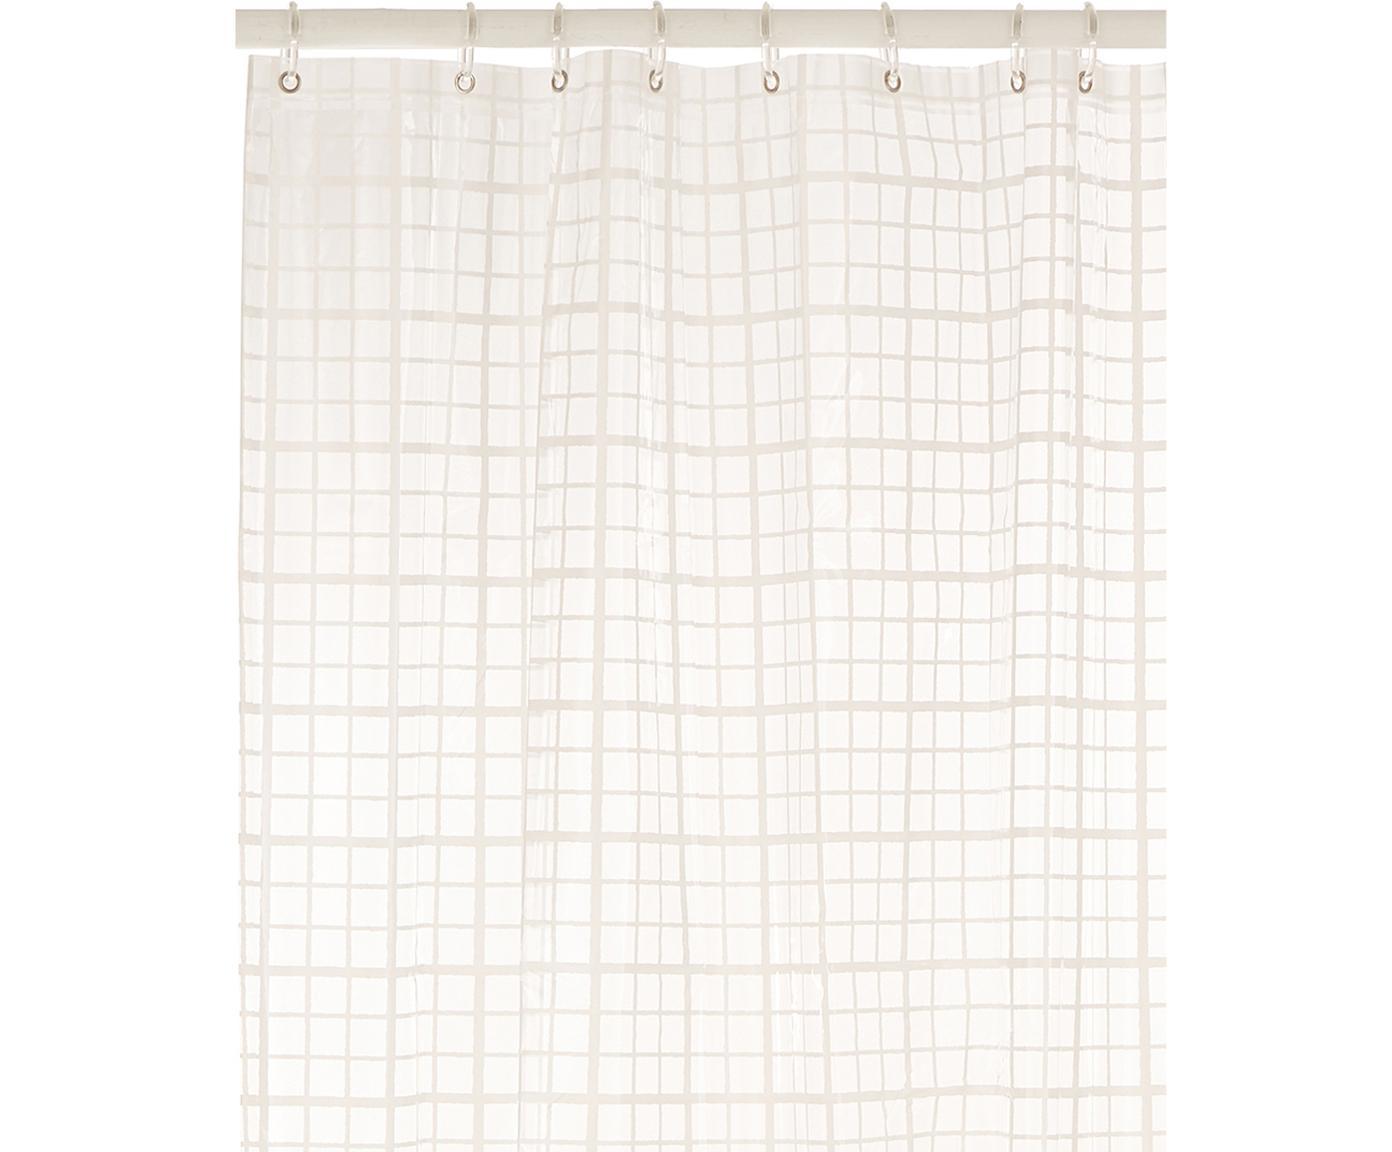 Kurzer  Duschvorhang Porto mit Karos, semi-transparent, Weiß, Grau, 180 x 180 cm